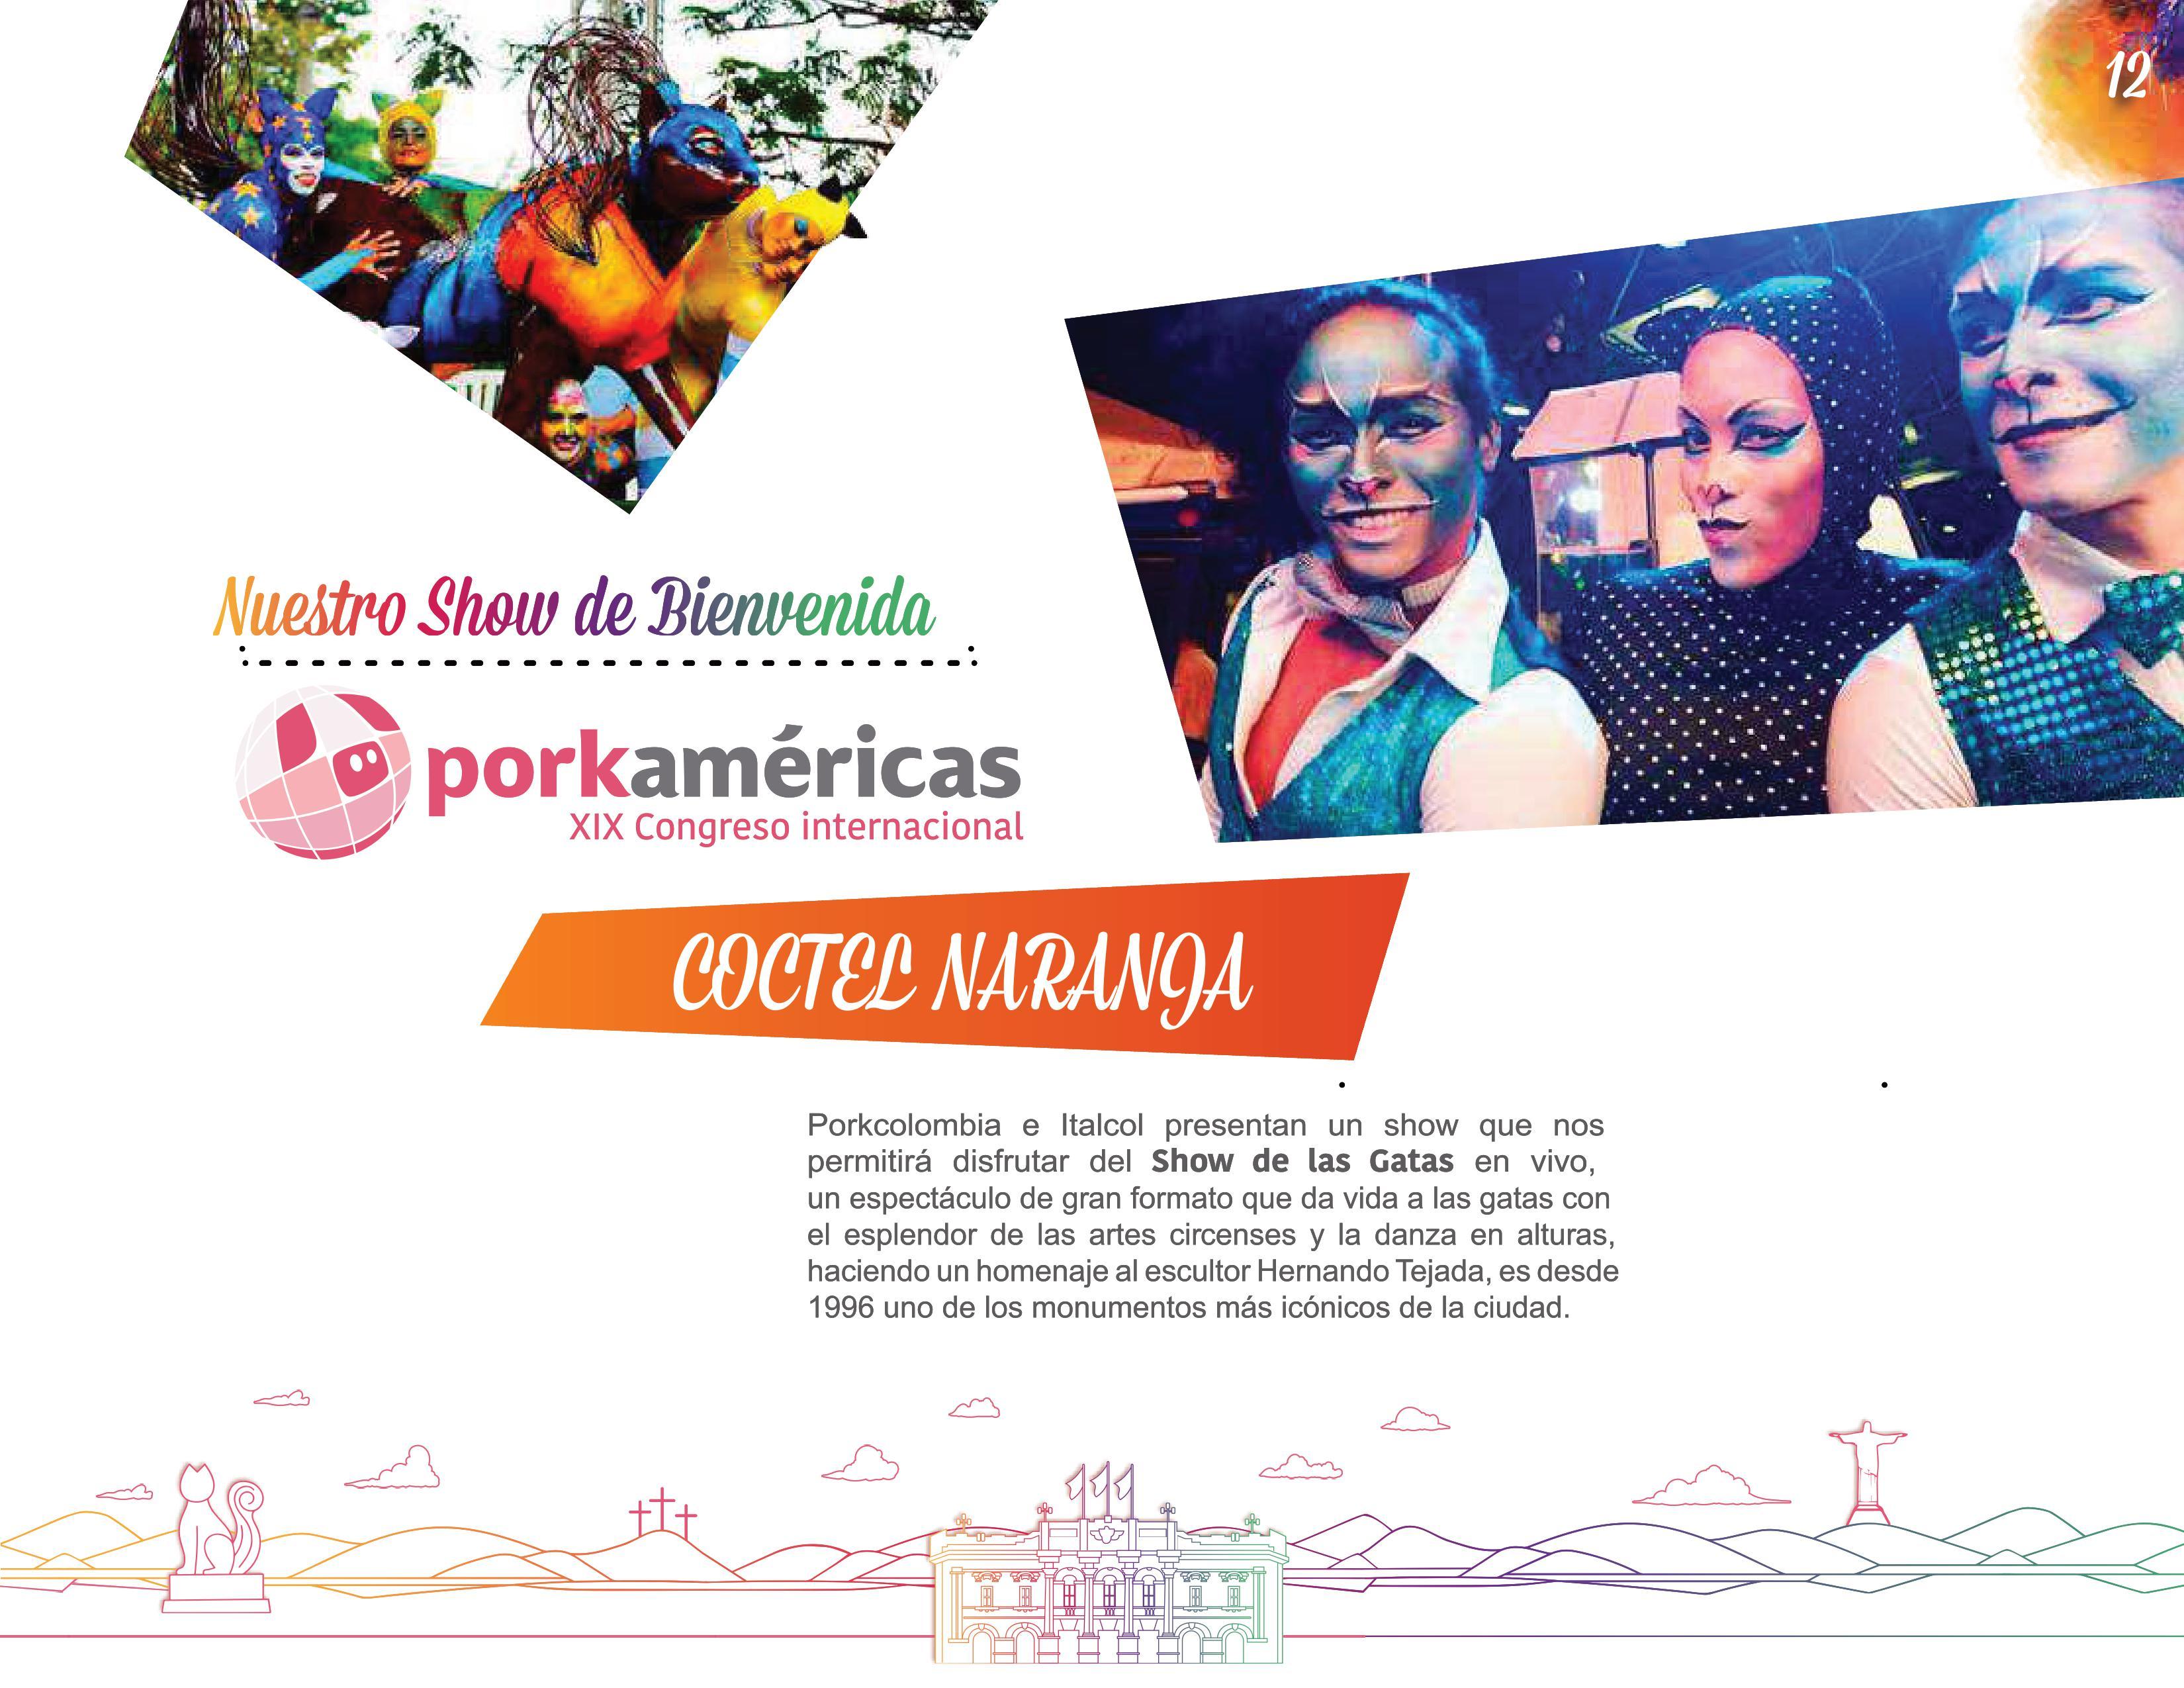 https://www.porkcolombia.co/wp-content/uploads/2018/05/coctel-naranja.jpg